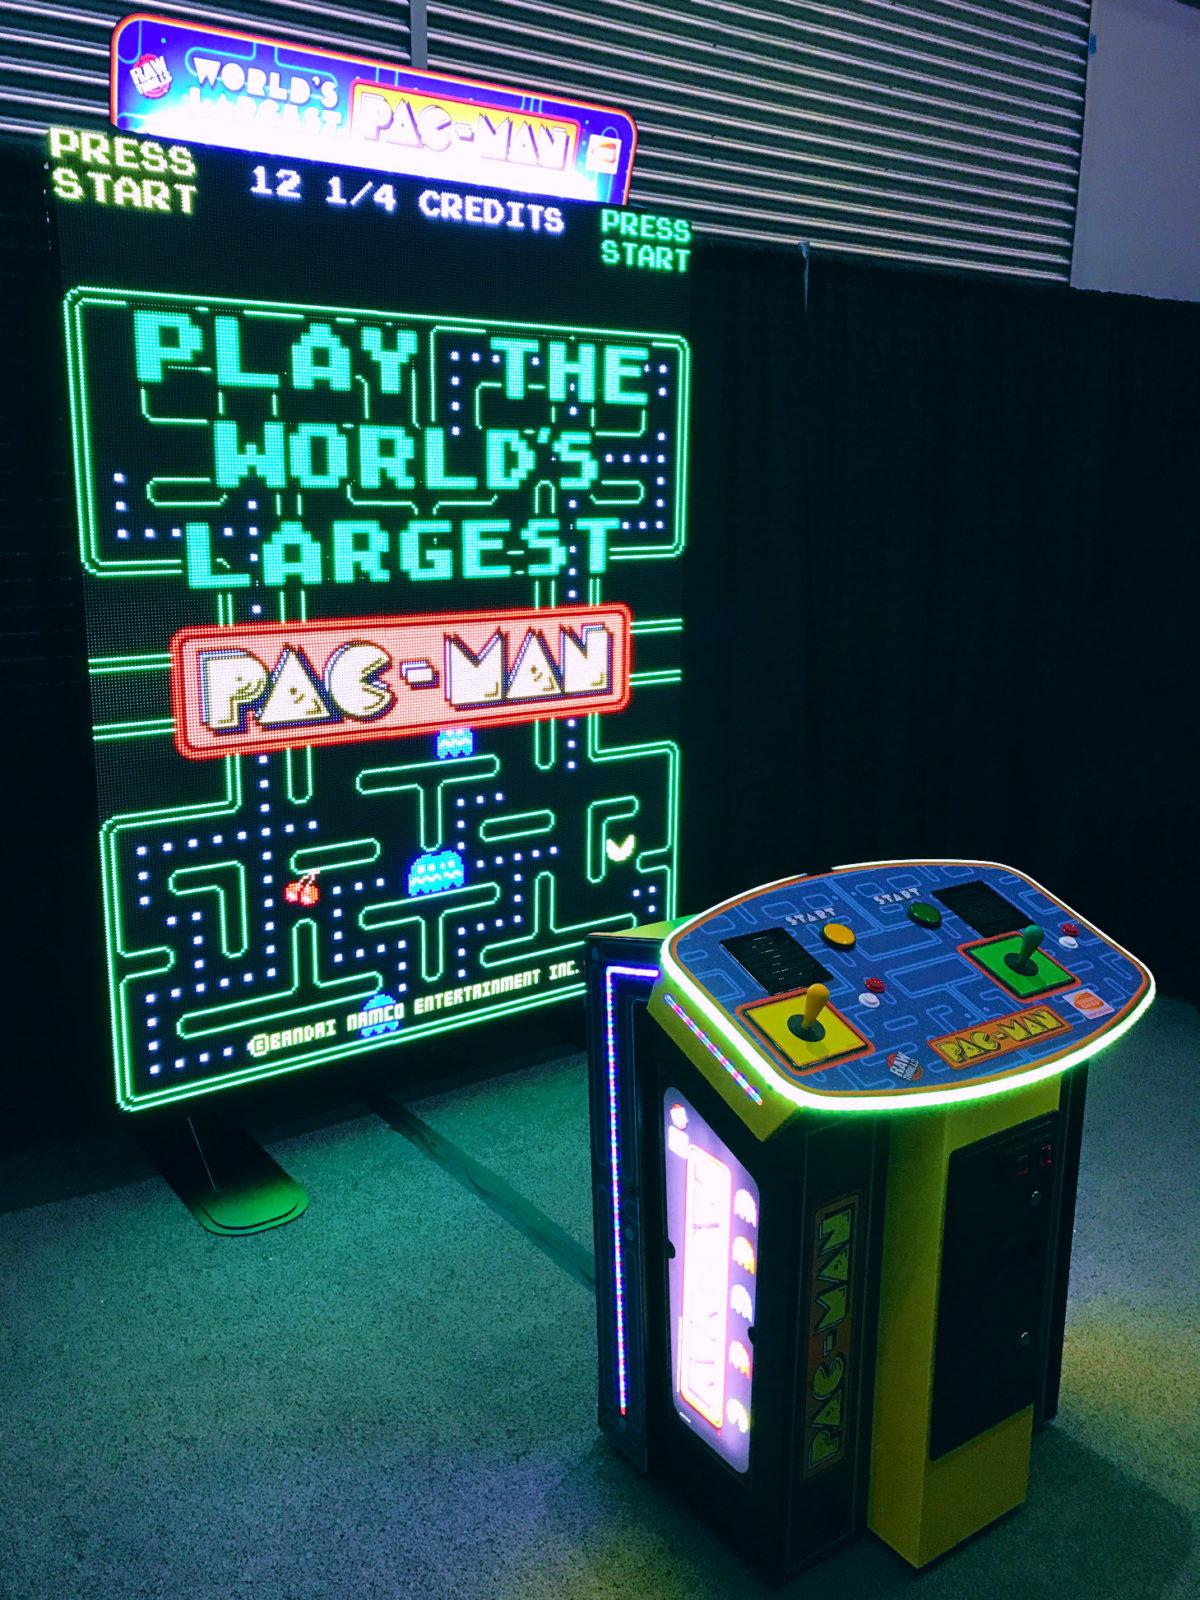 World's Largest Pac-Man arcade game rental